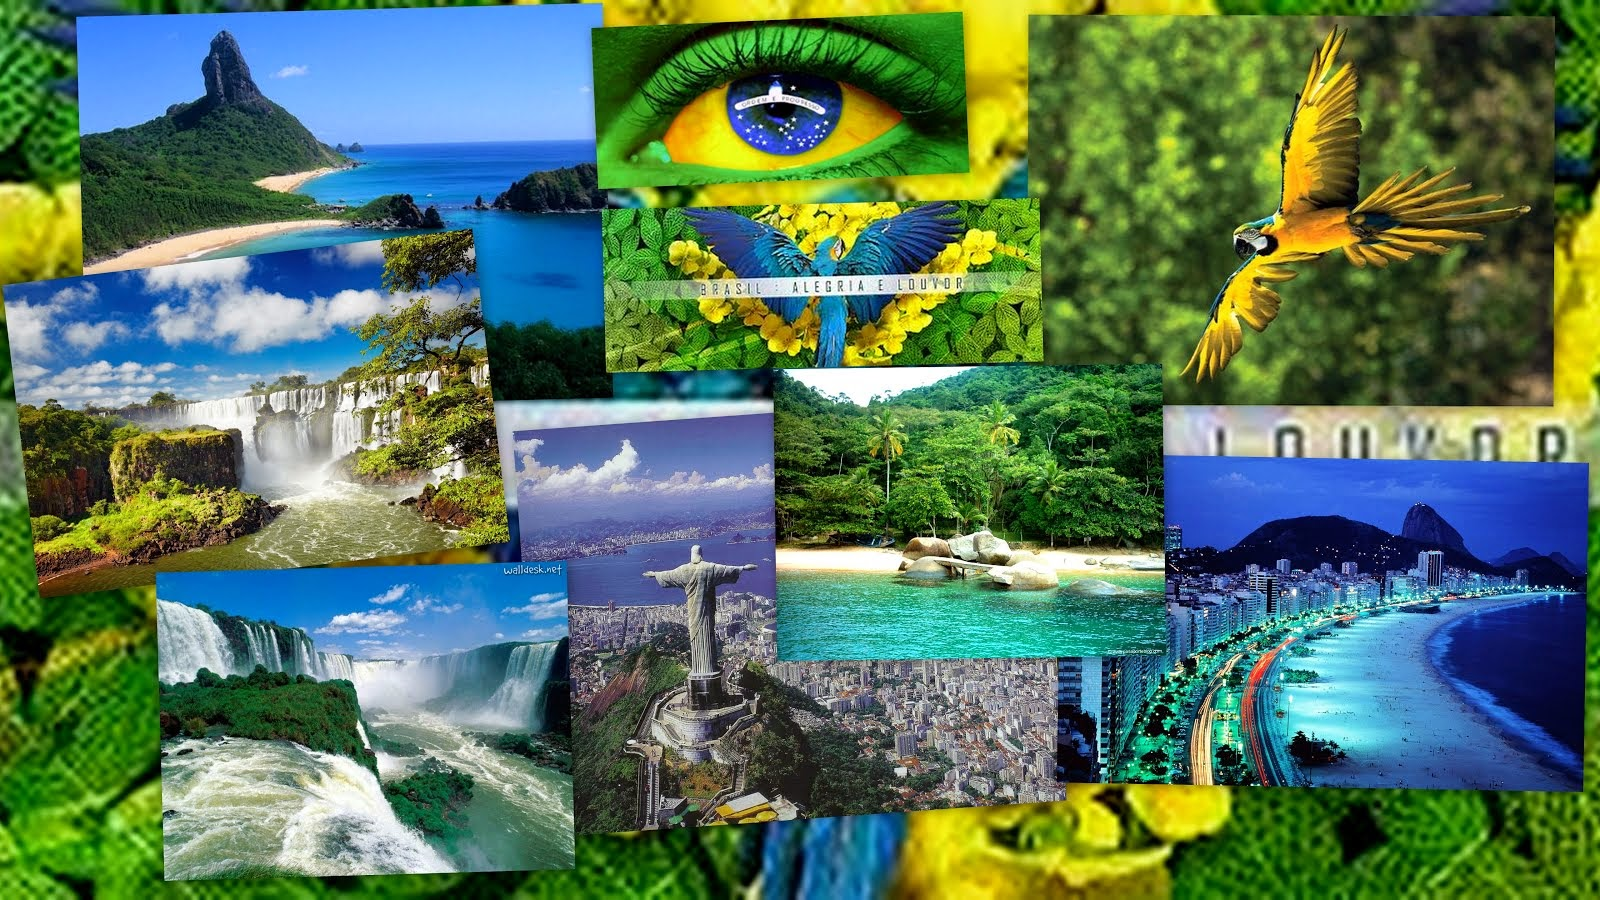 Letra cancion antigua brasil hd 1080p 4k foto for Inmobiliaria mangana